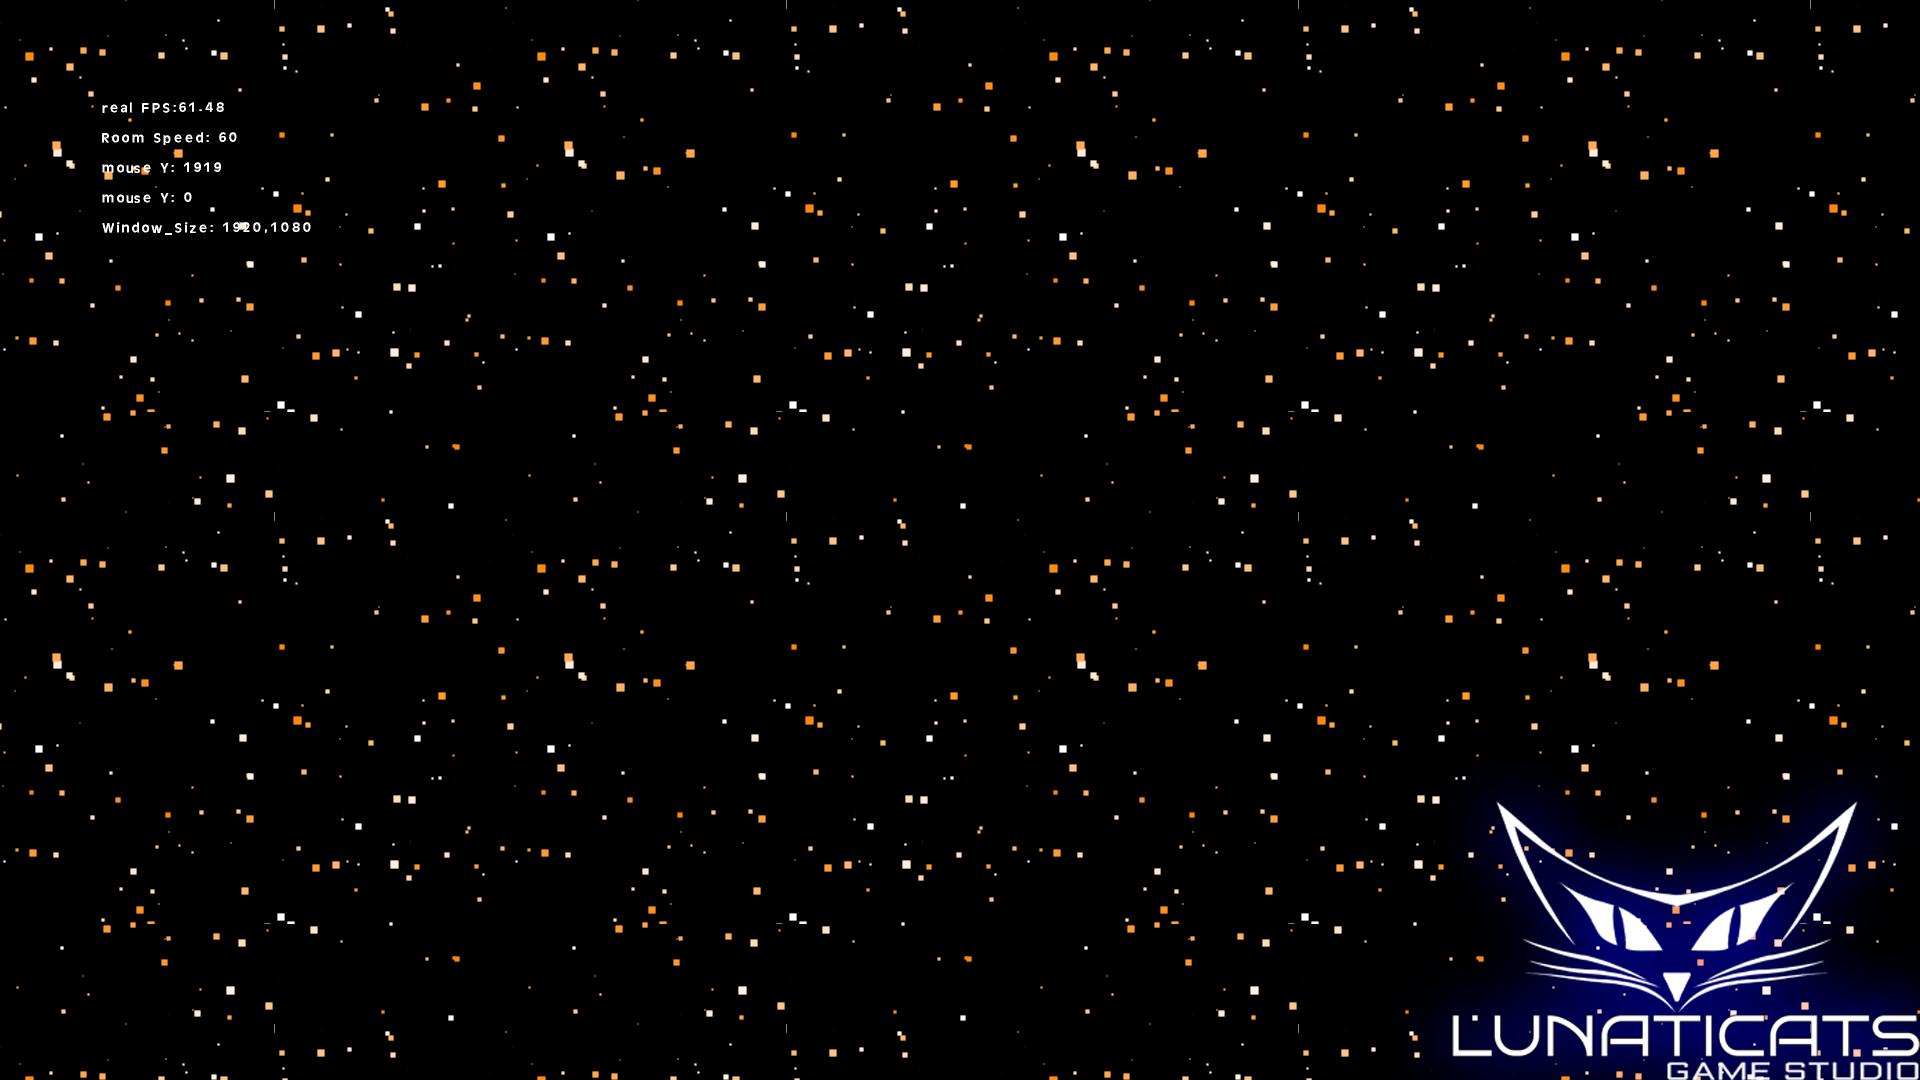 Background image maker - Png 1920x1080 Space Game Maker Background